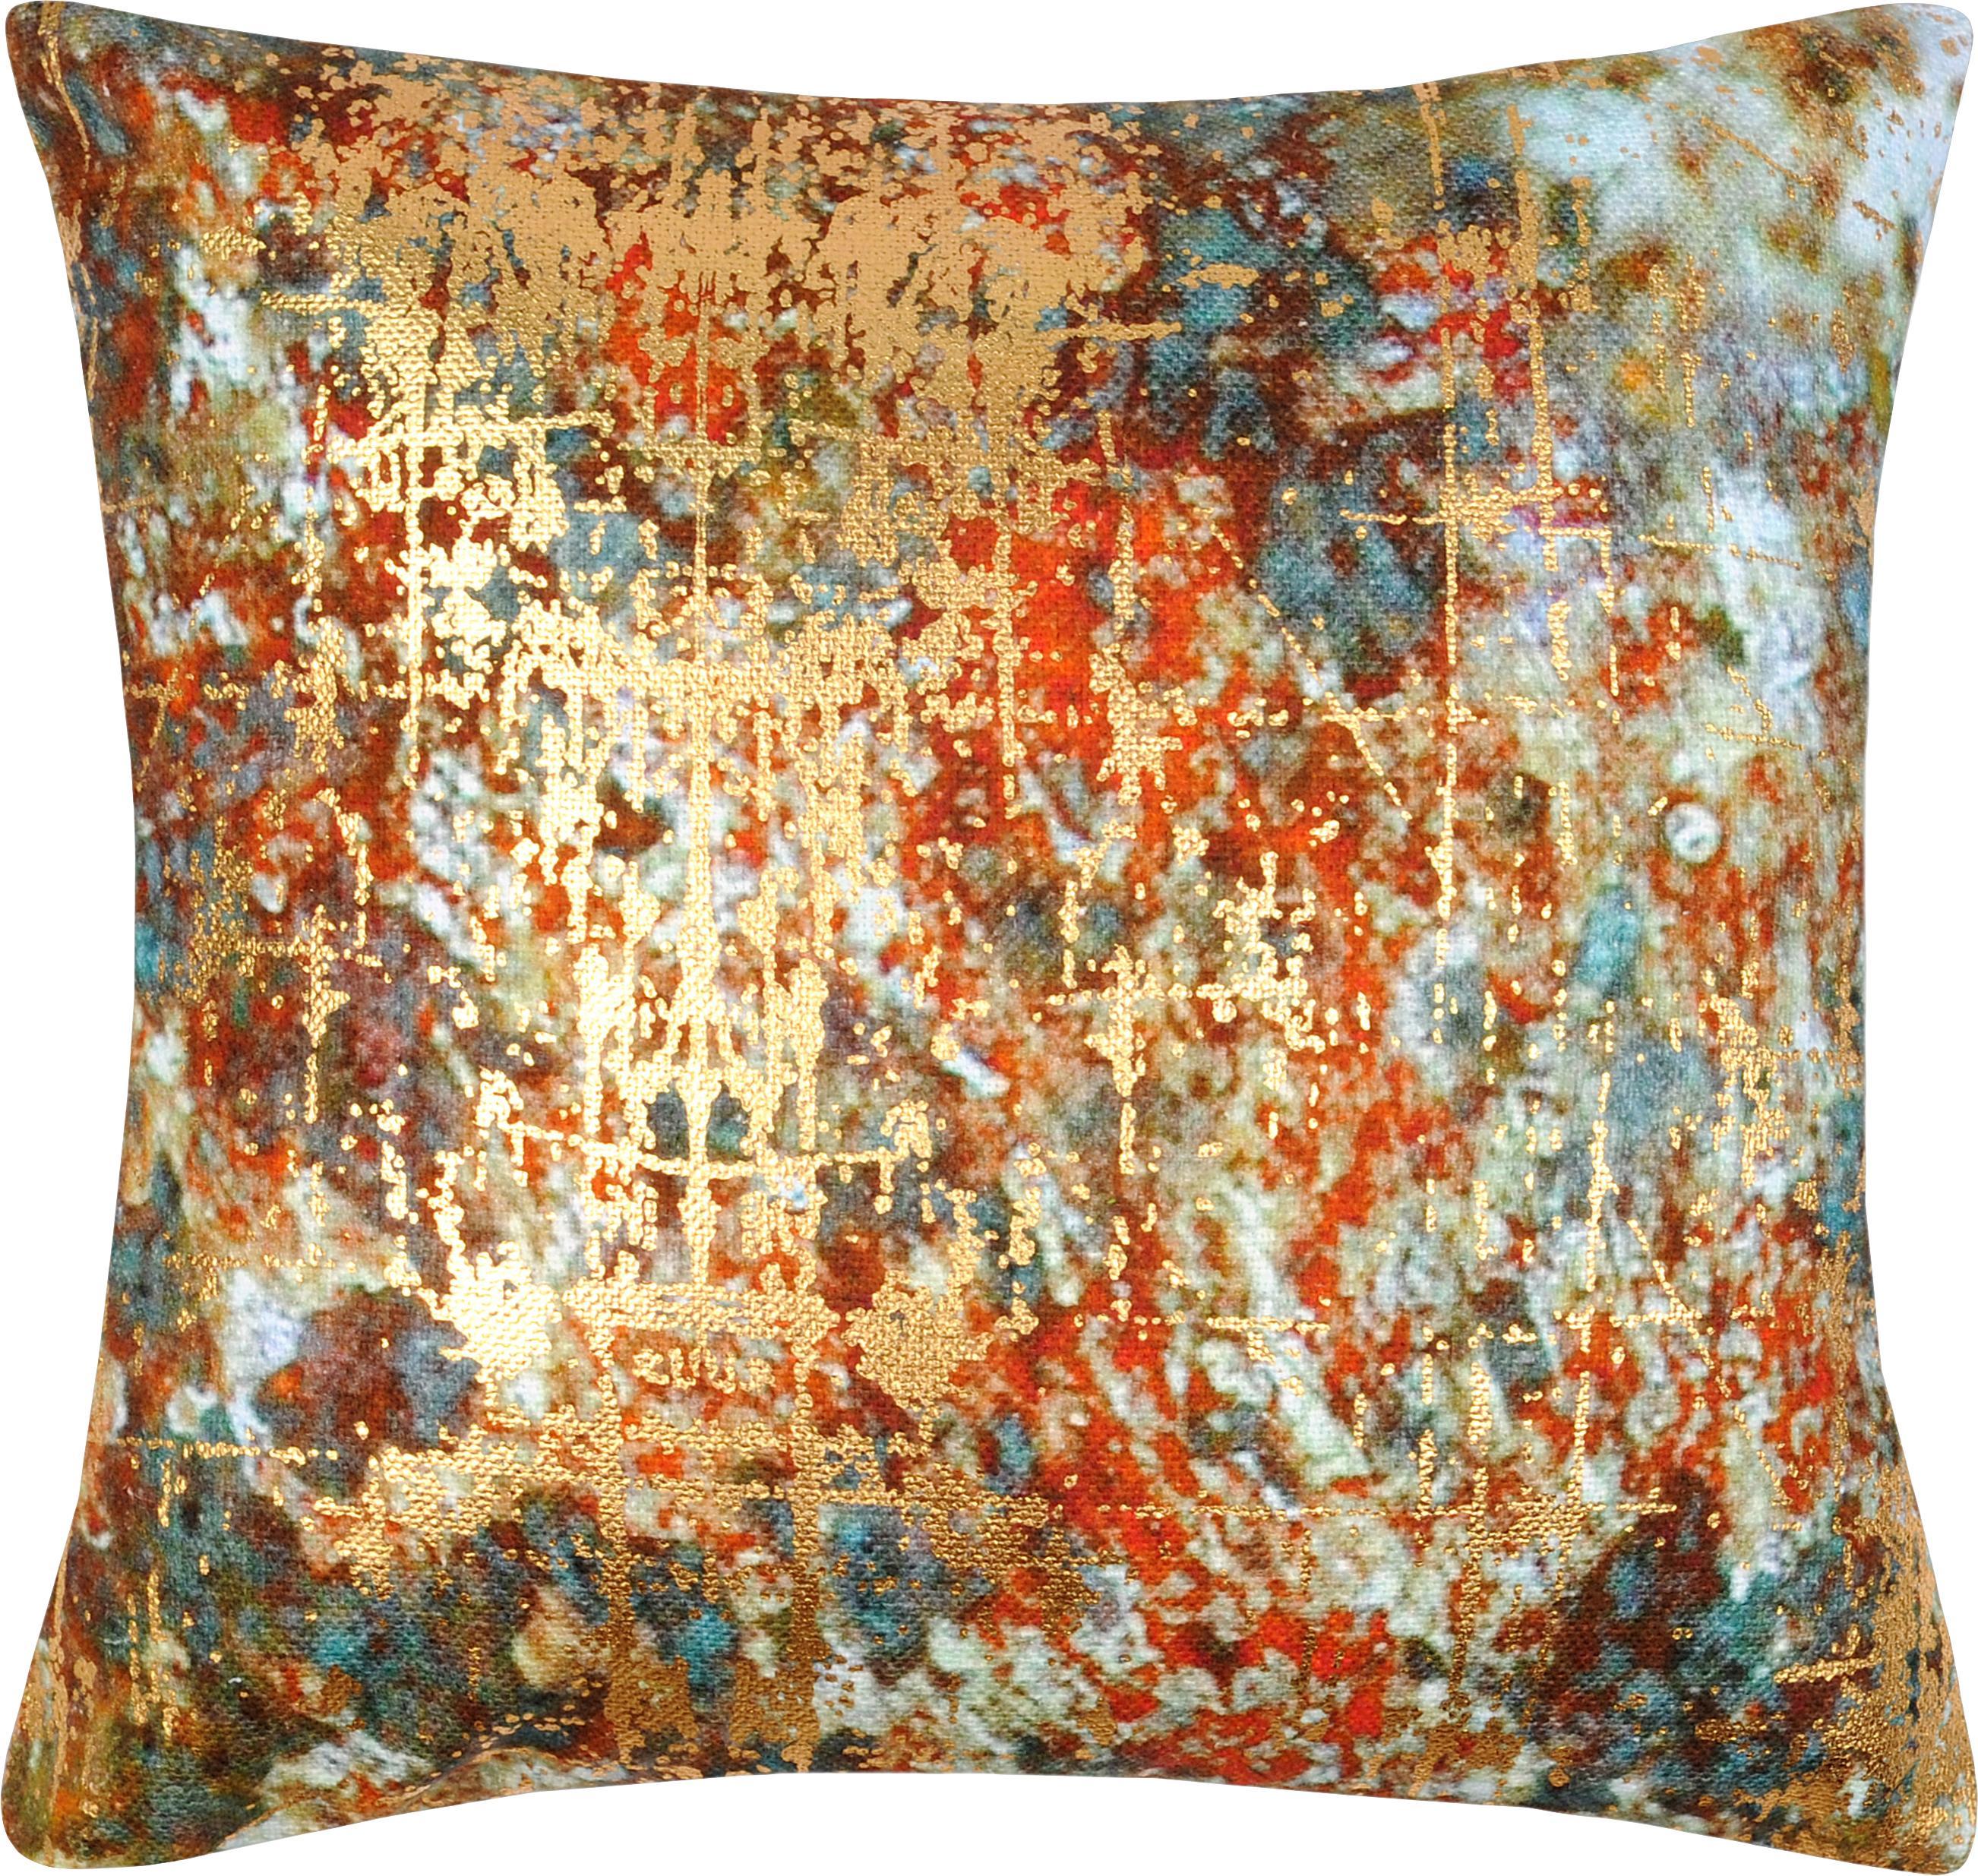 Kussenhoes Fabienn, Katoen, Multicolour, goudkleurig, 40 x 40 cm